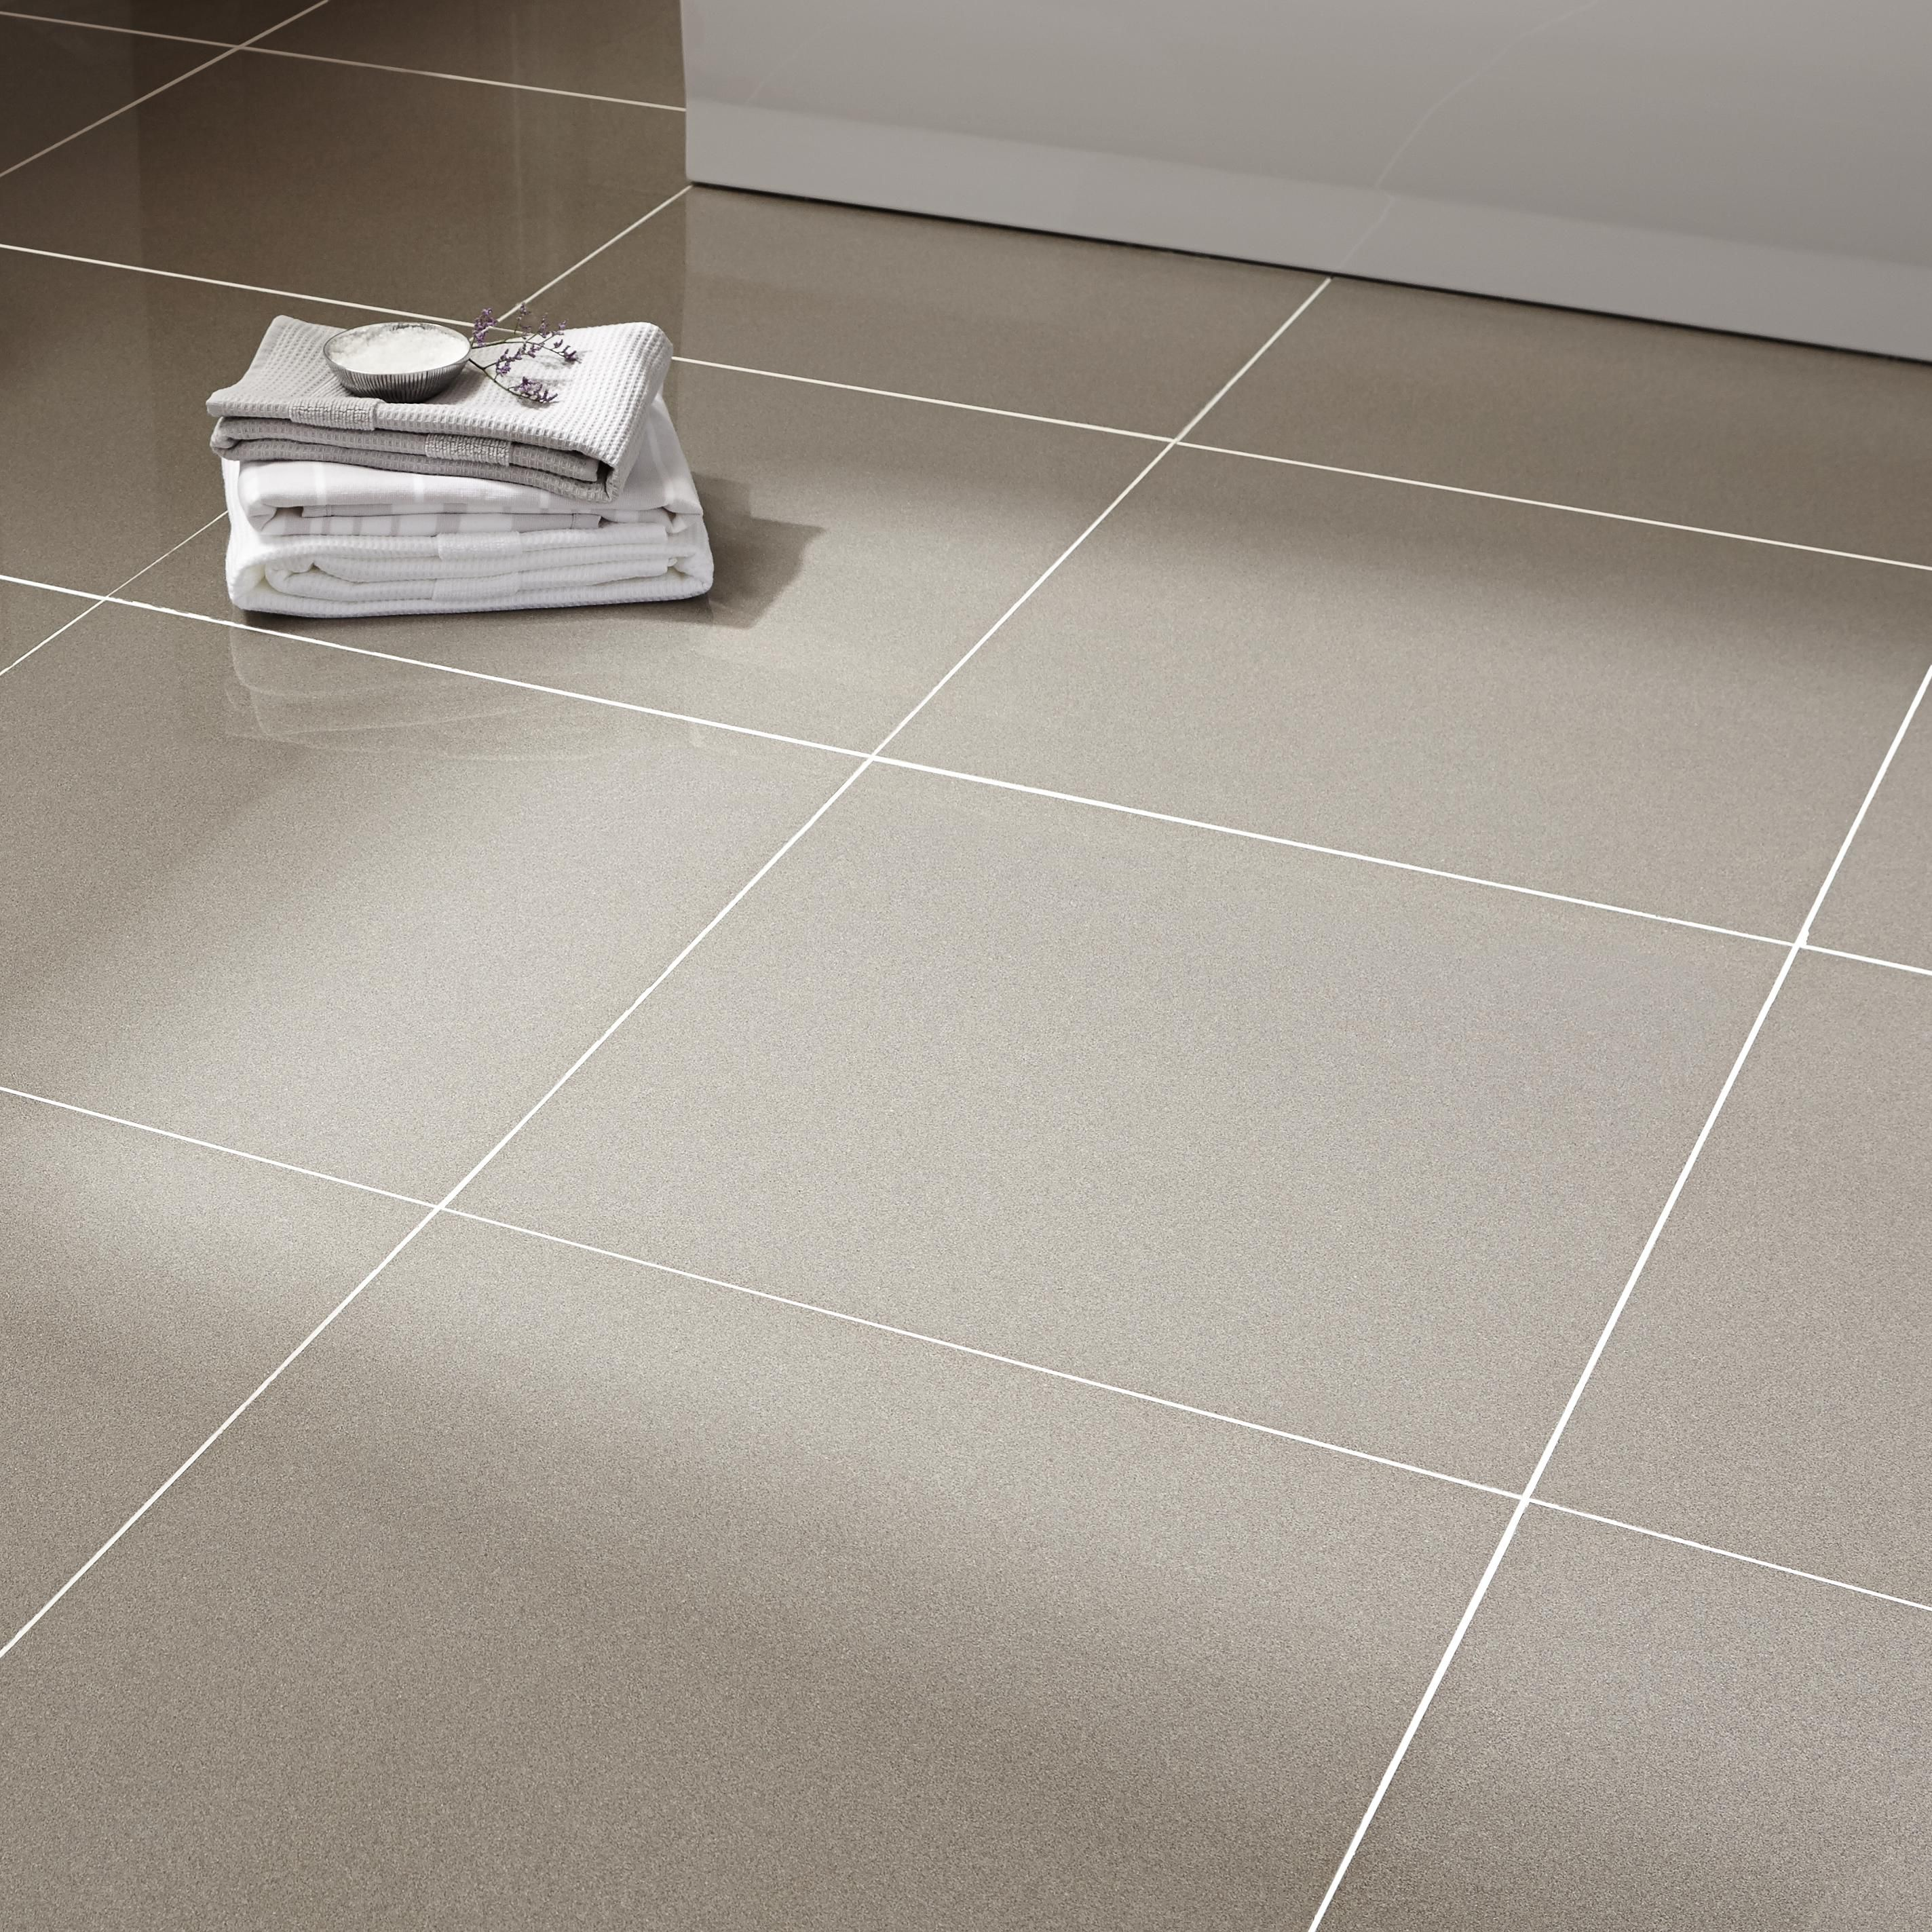 how to lay floor tiles ideas advice diy at b q rh diy com laying floor tiles upstairs bathroom laying bathroom floor tiles around toilet